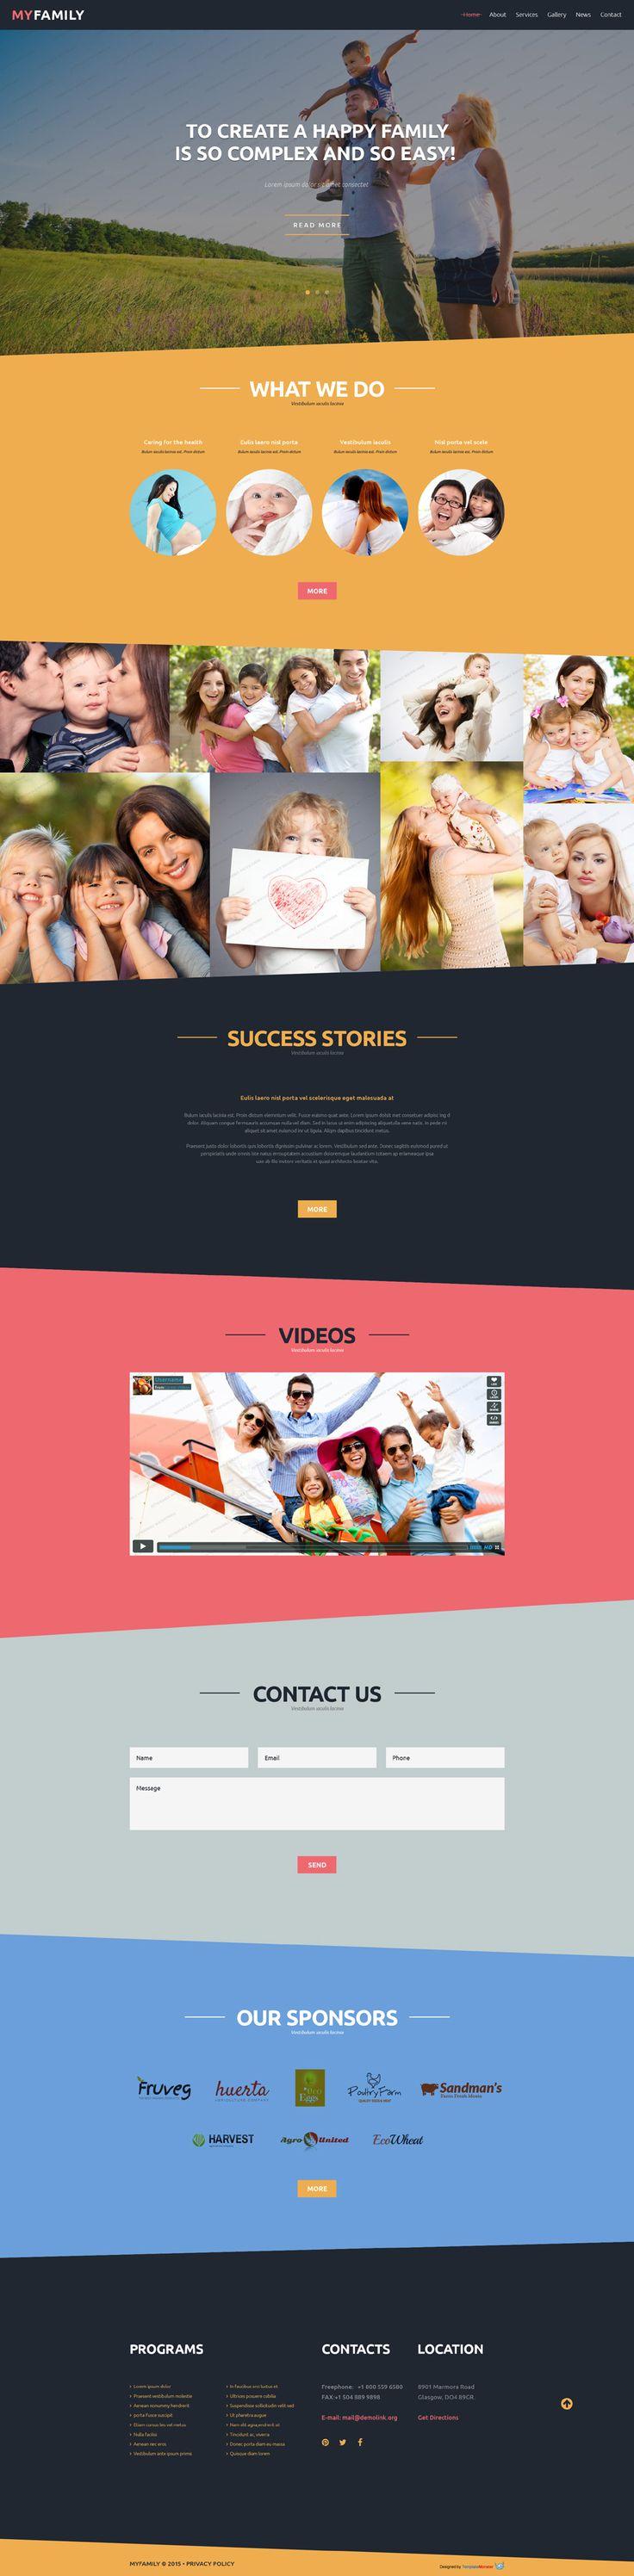 144 best FREE Website Templates images on Pinterest